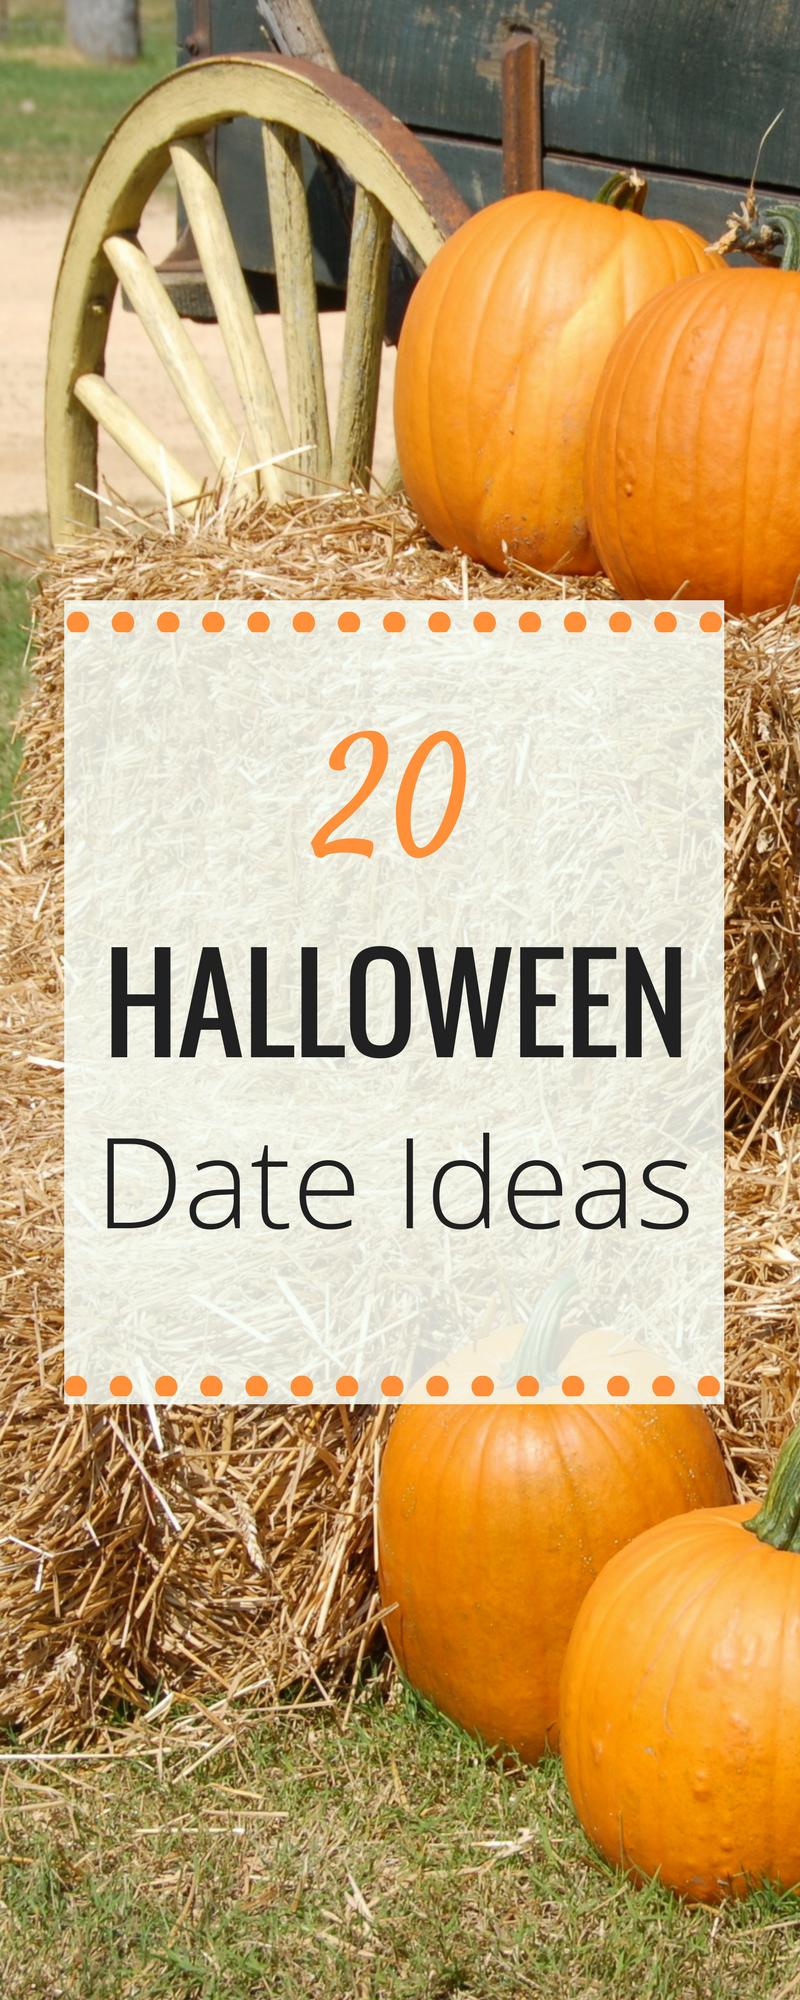 Halloween Date Ideas 20 Perfect Halloween Date Nights